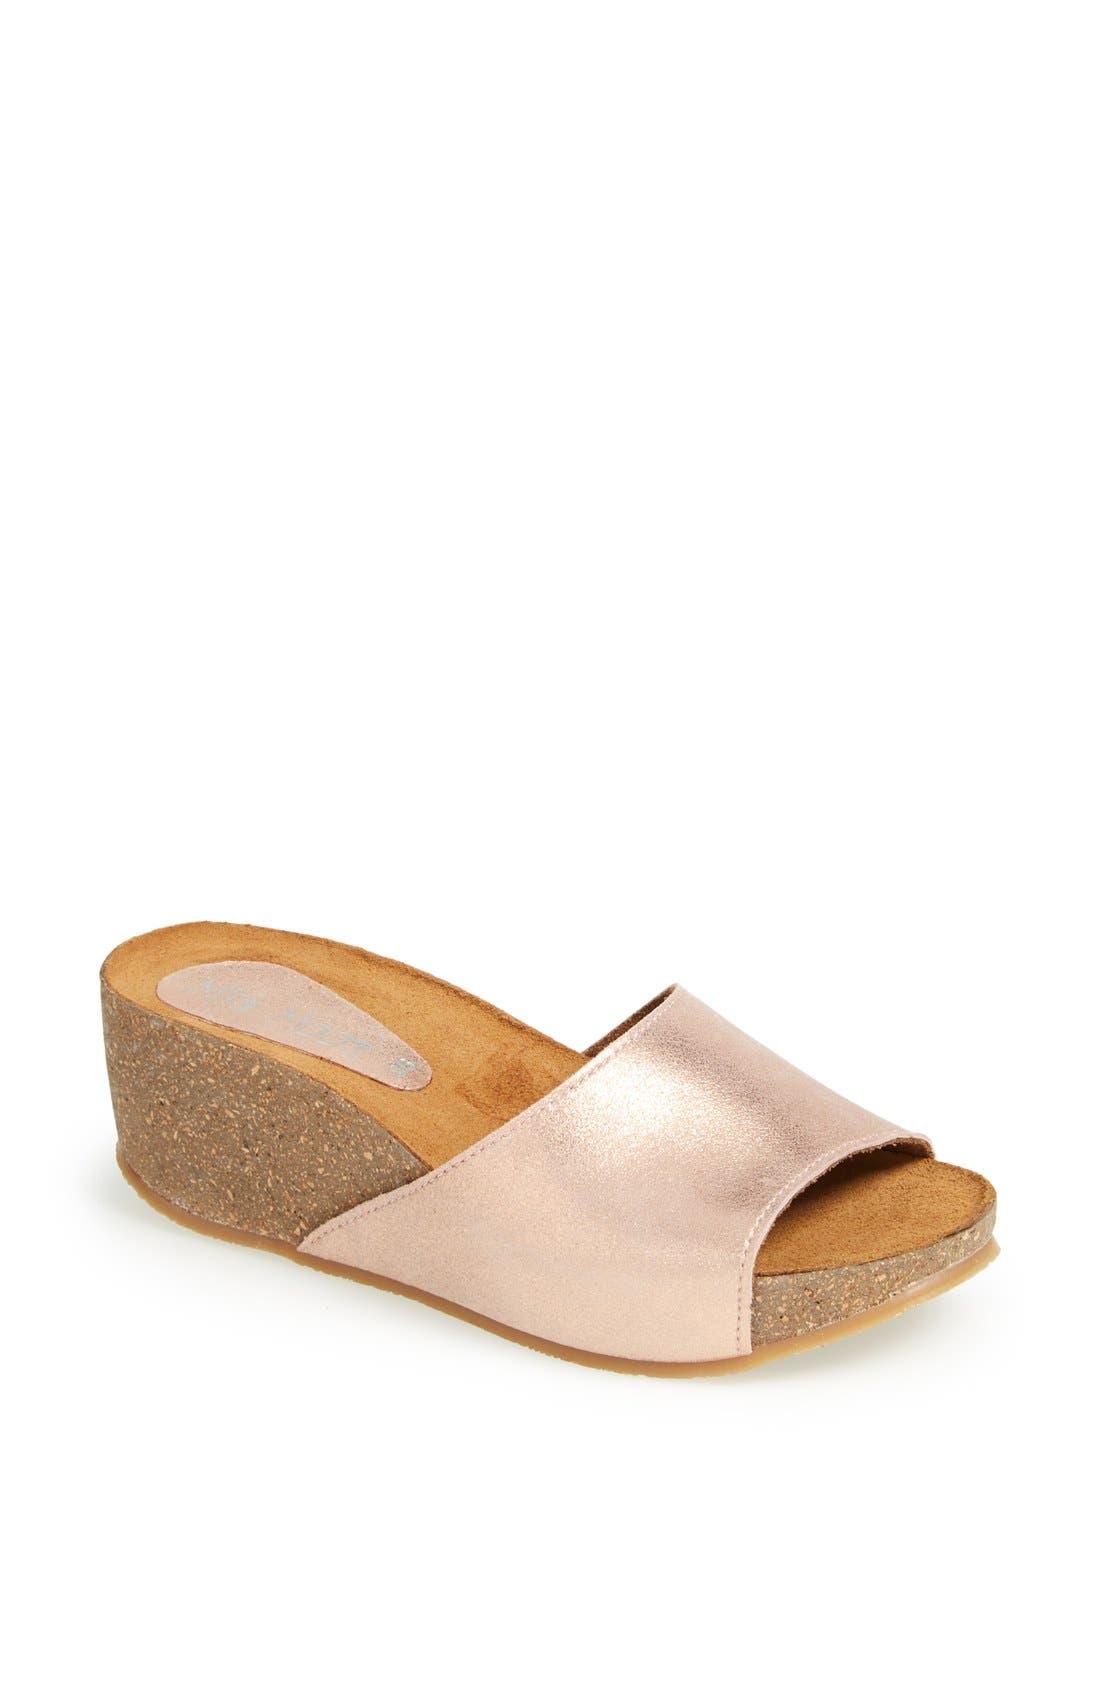 Main Image - Miz Mooz 'Enid' Slide Sandal